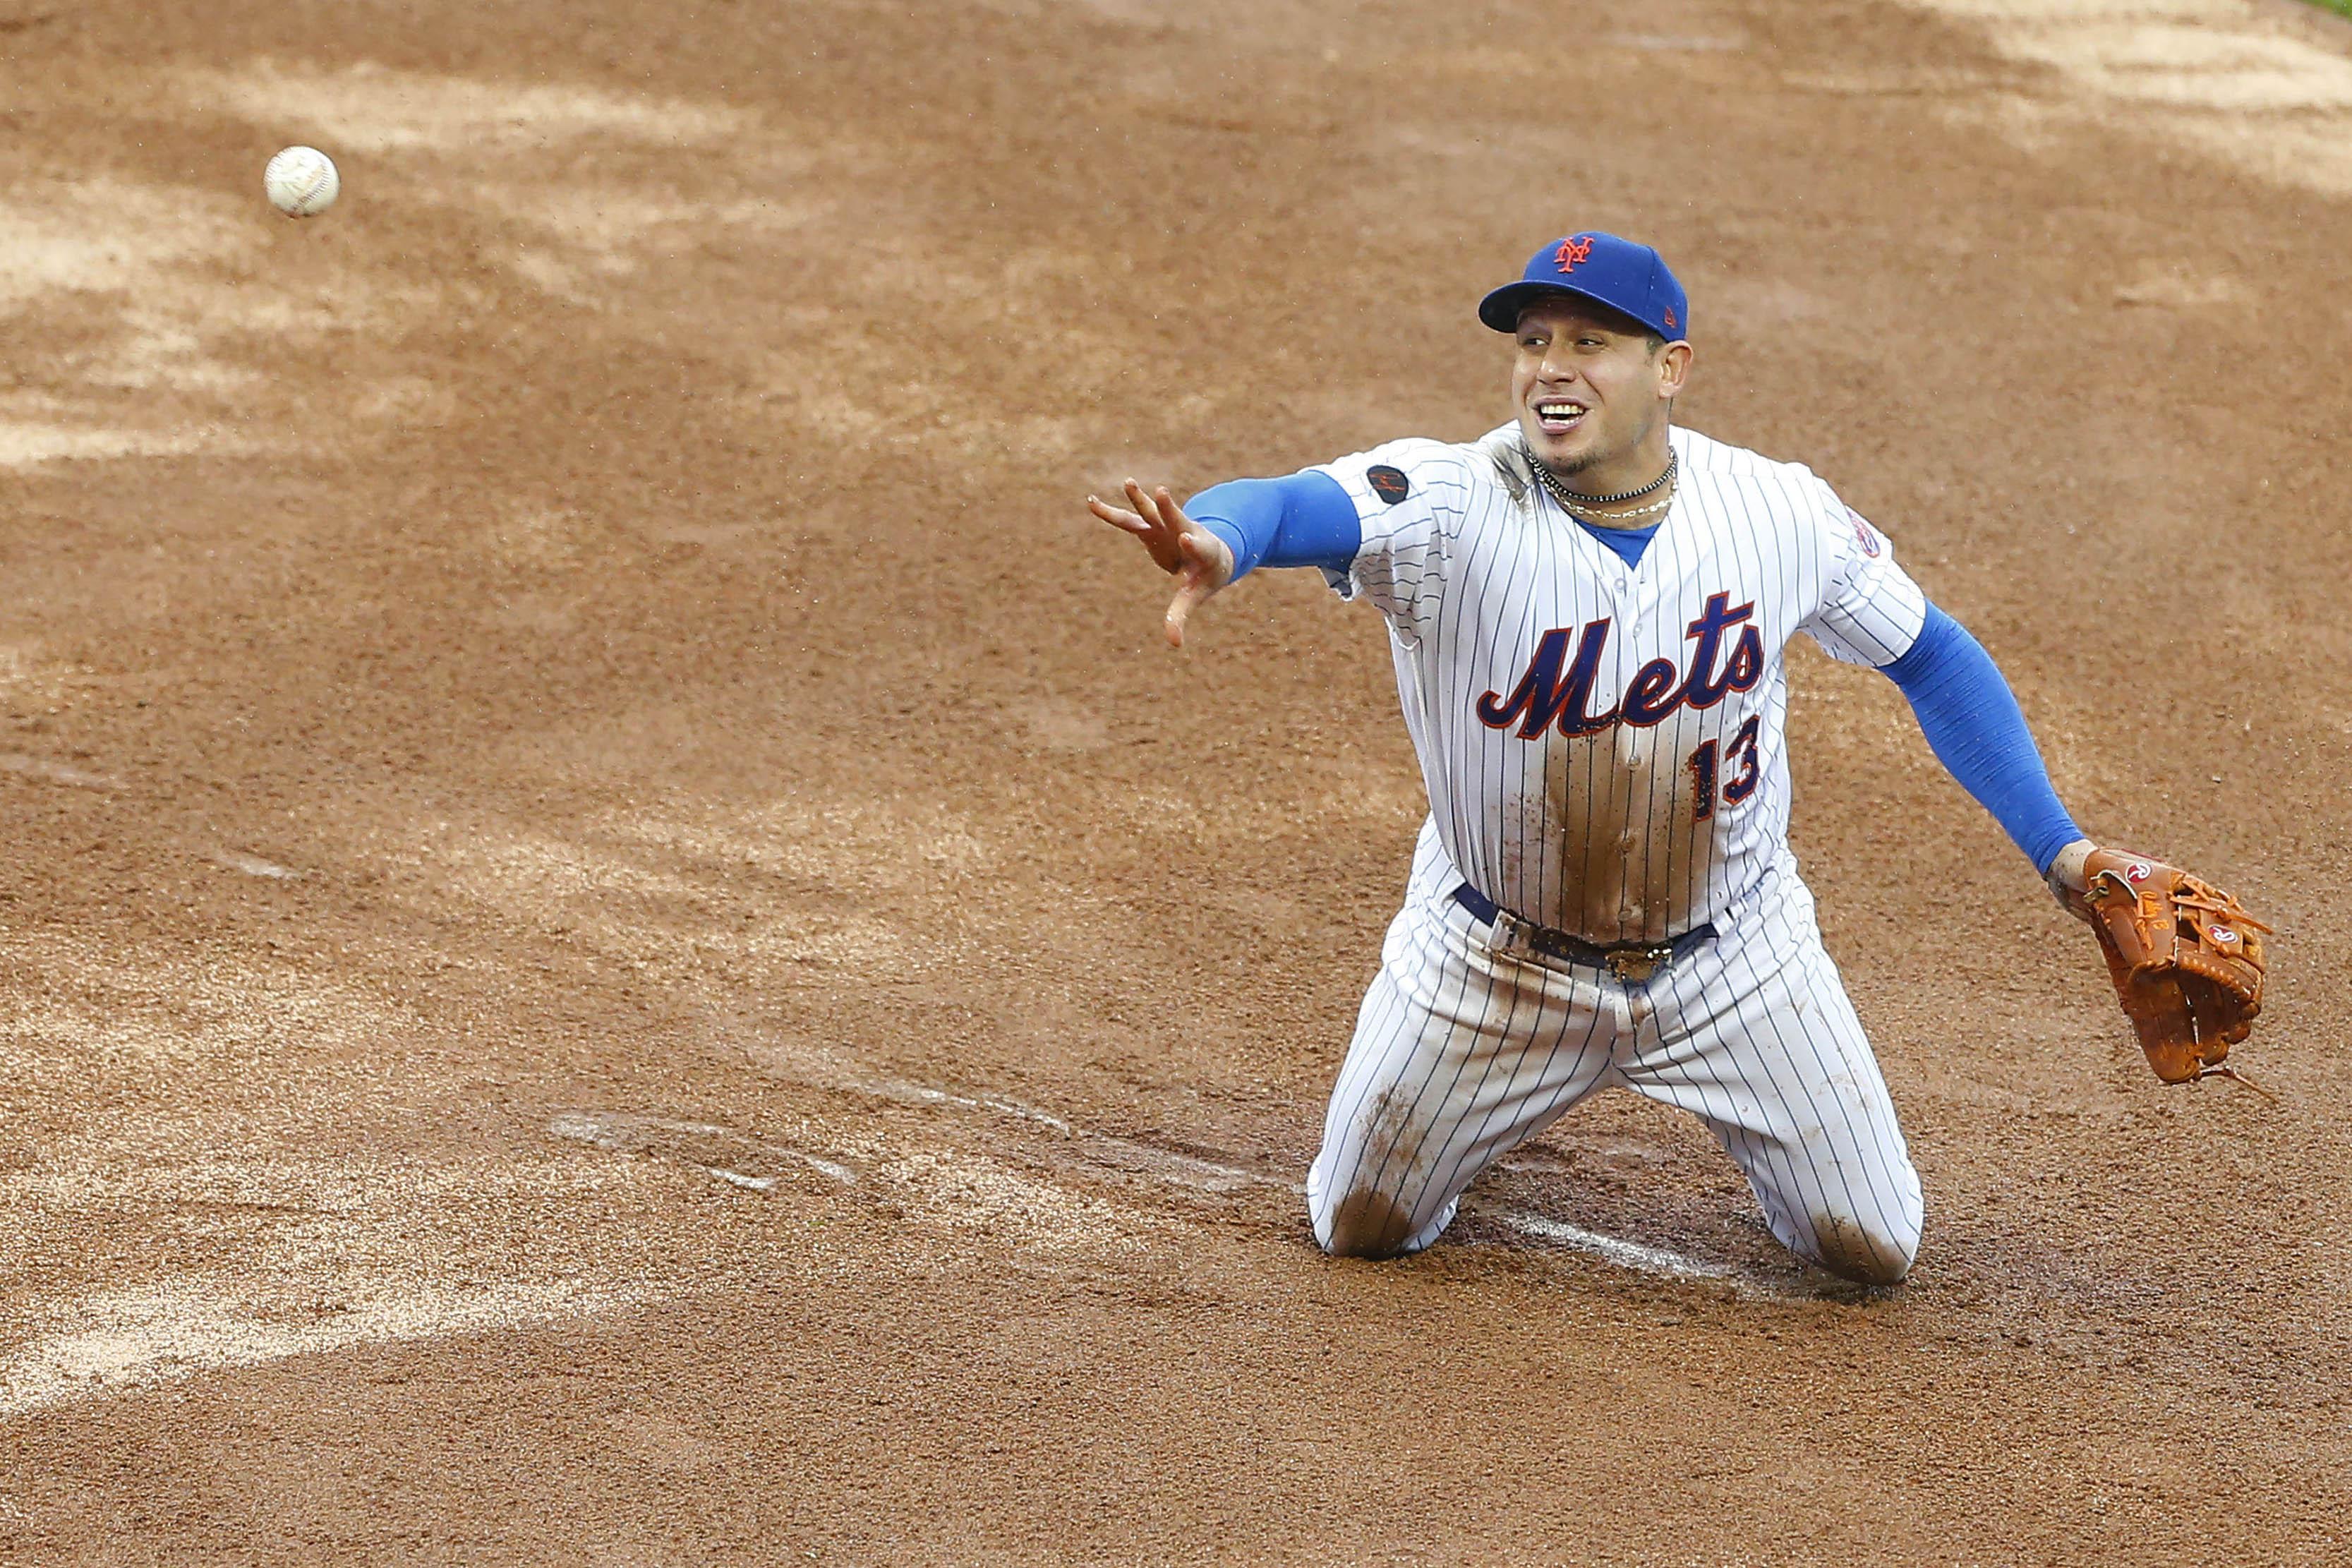 5/18/18 Game Preview: Arizona Diamondbacks at New York Mets